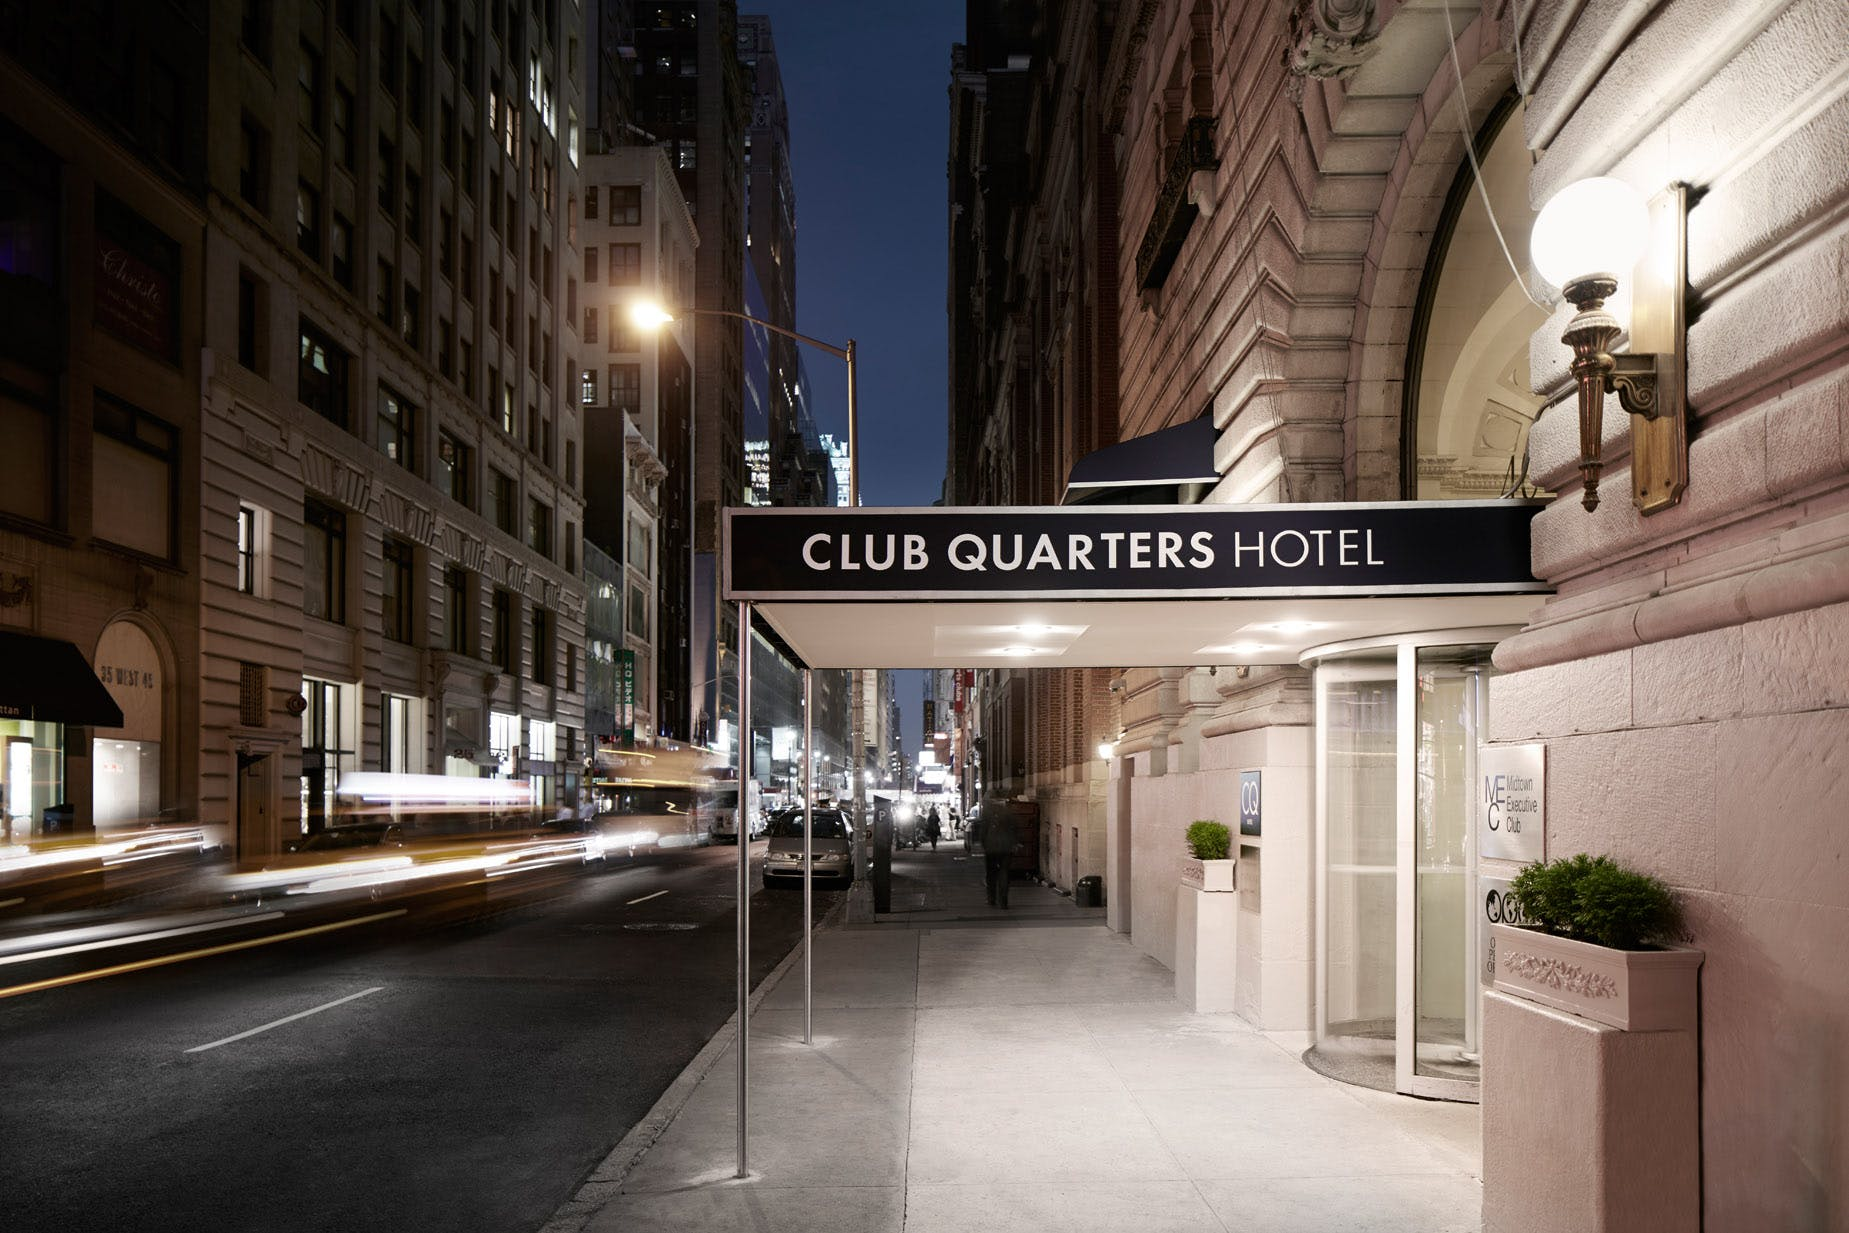 Exterior of Club Quarters Hotel, Times Square